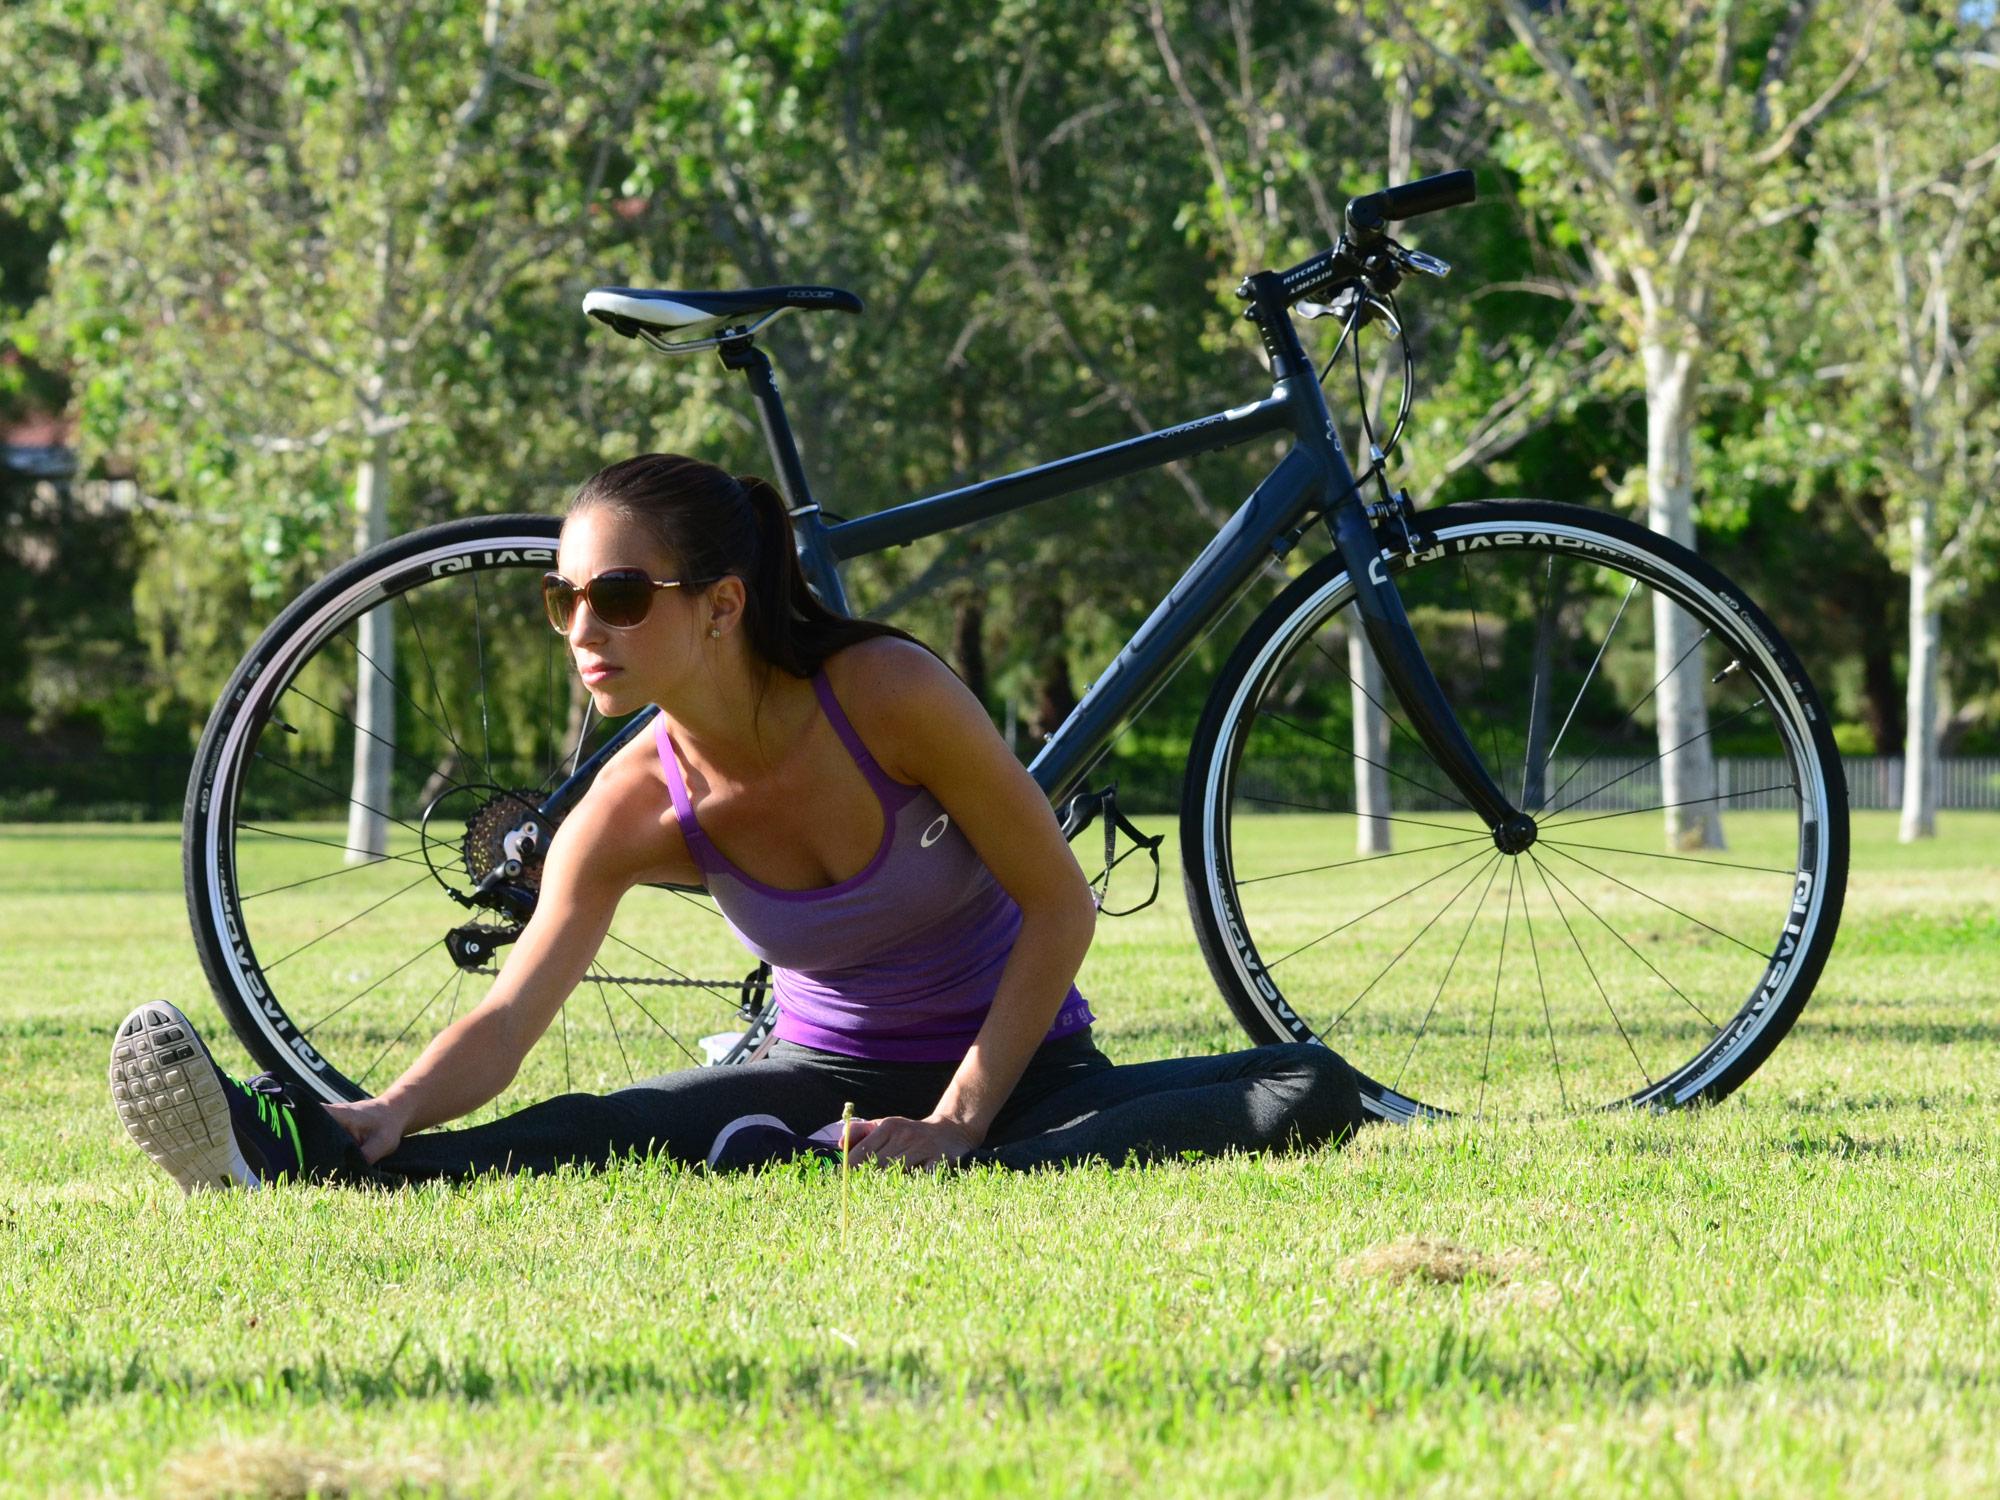 khs-fitness-01c-2000 - KHS Bicycles